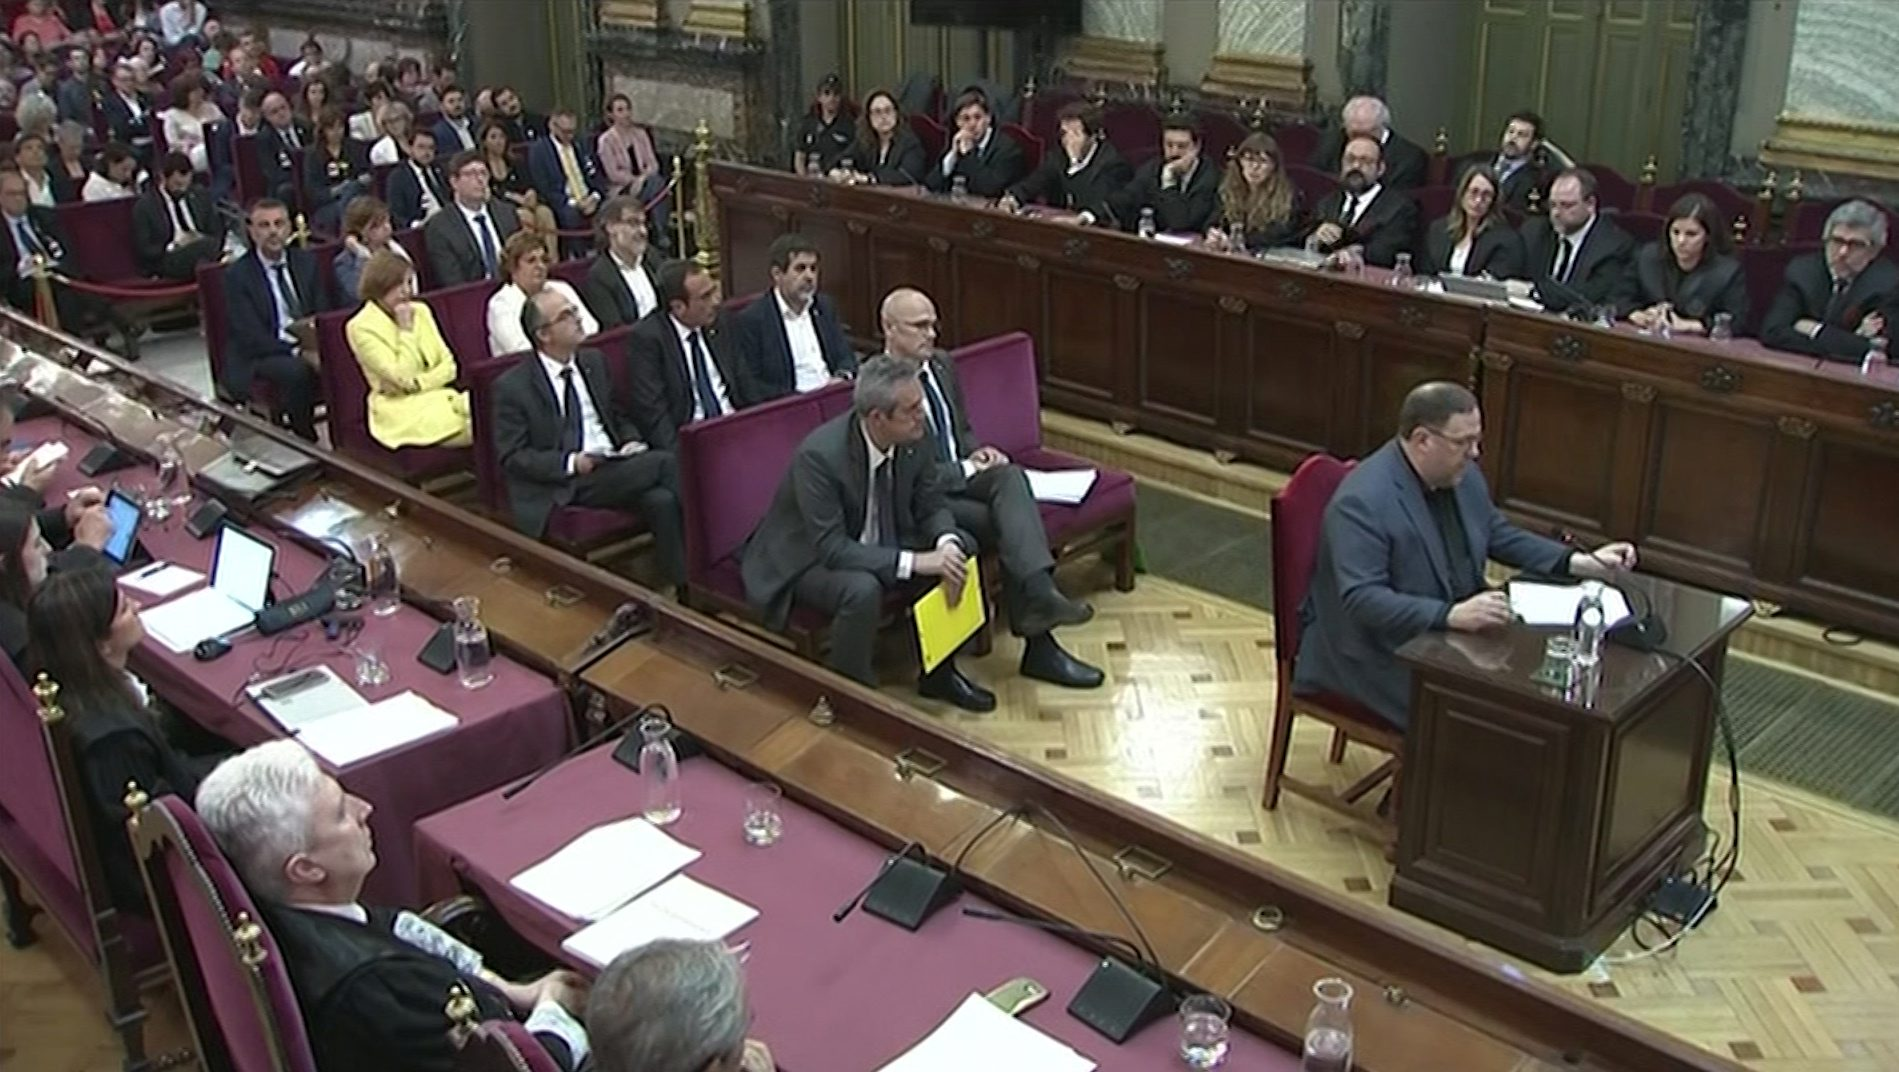 2019-06-12T150410Z_181467617_RC1DC4477420_RTRMADP_3_SPAIN-POLITICS-CATALONIA